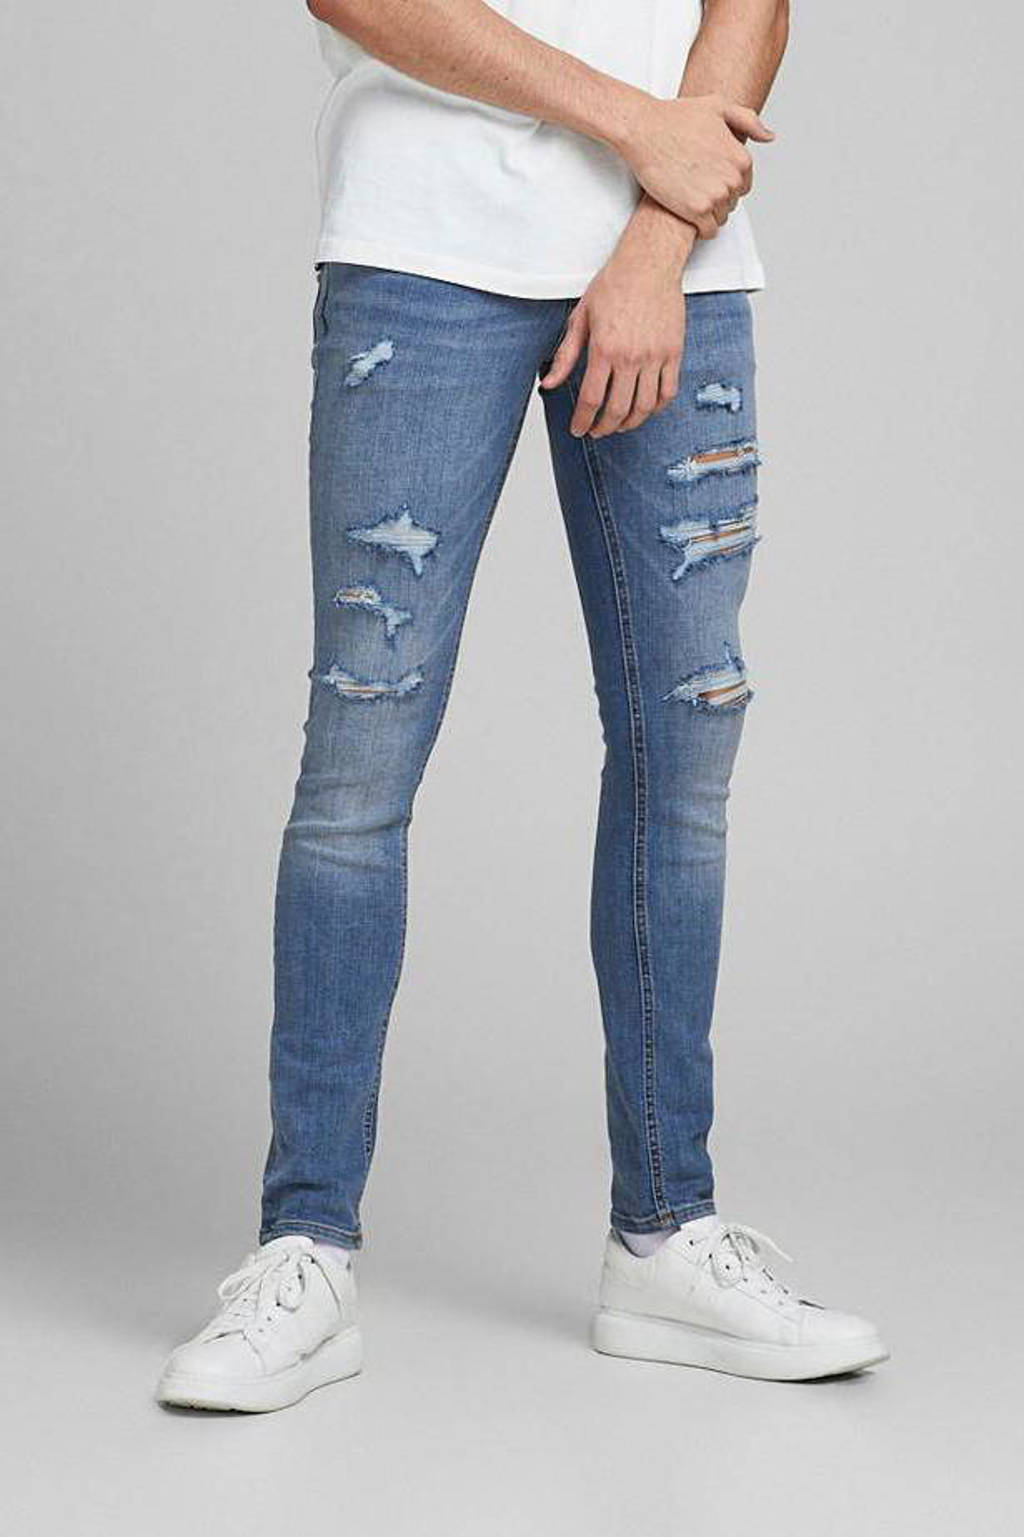 JACK & JONES JEANS INTELLIGENCE skinny jeans Liam blue denim, Blue denim